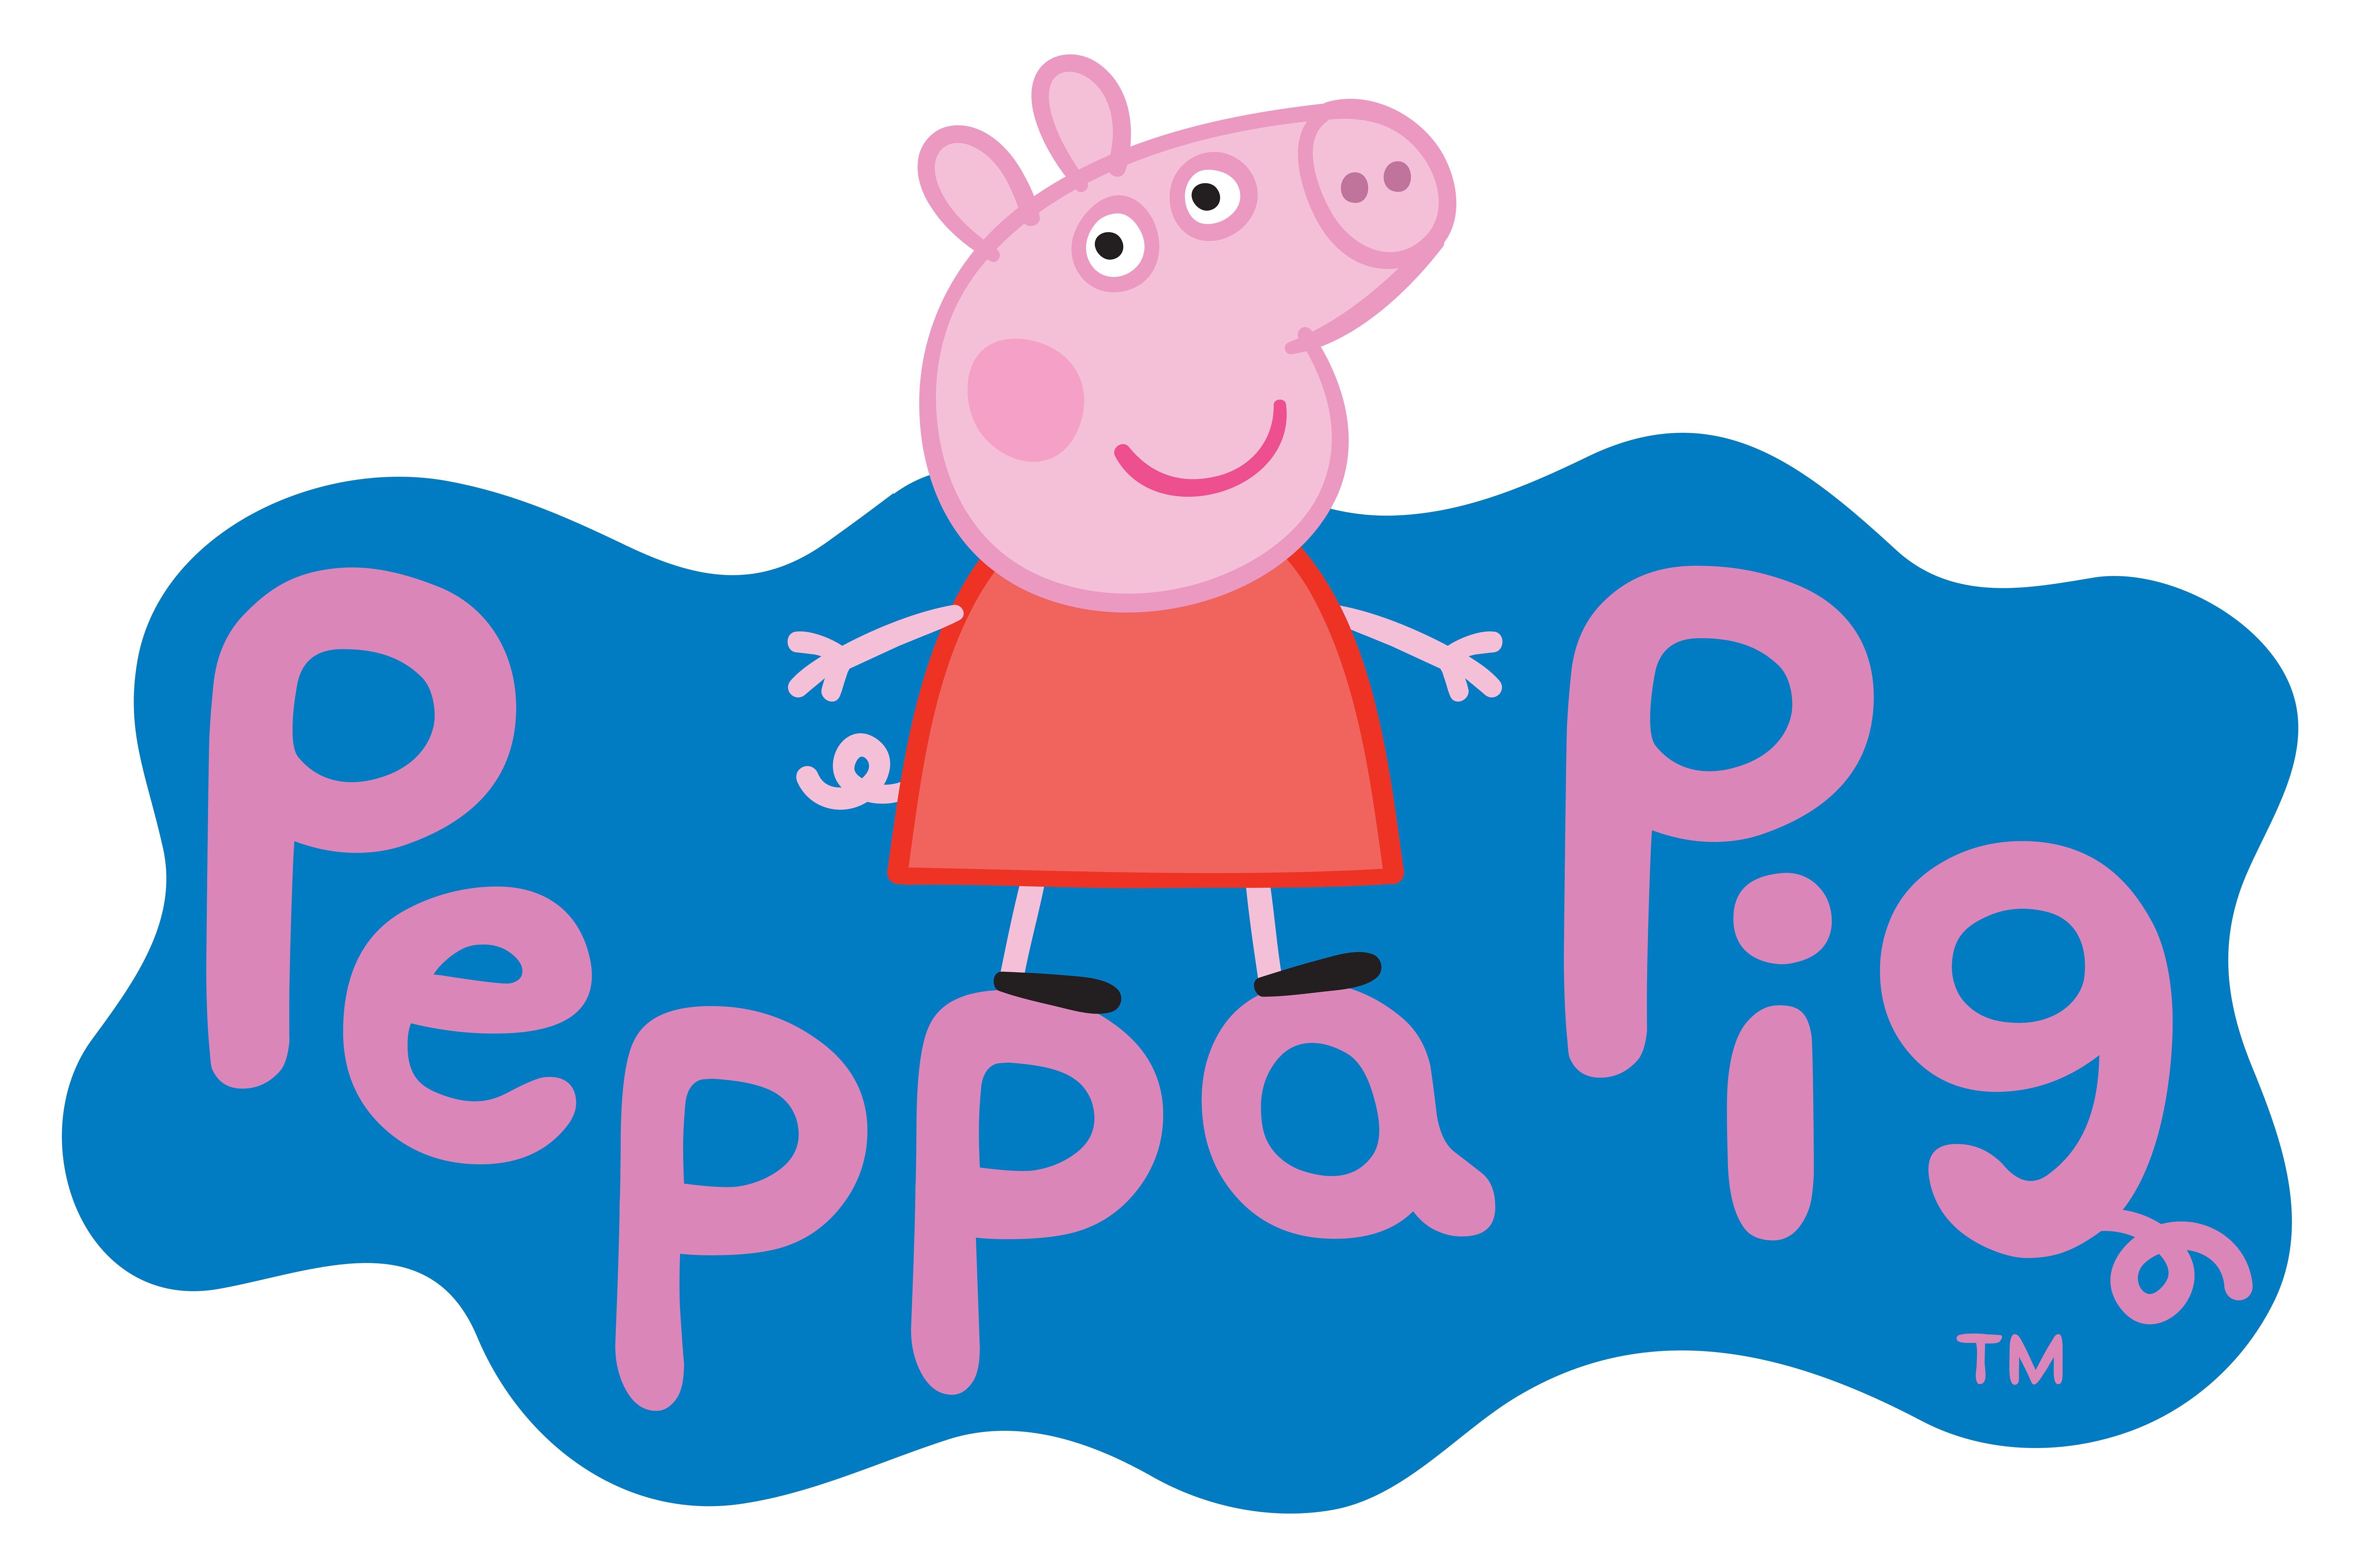 Peppa Pig Logo Transparent PNG Clip Art Image.